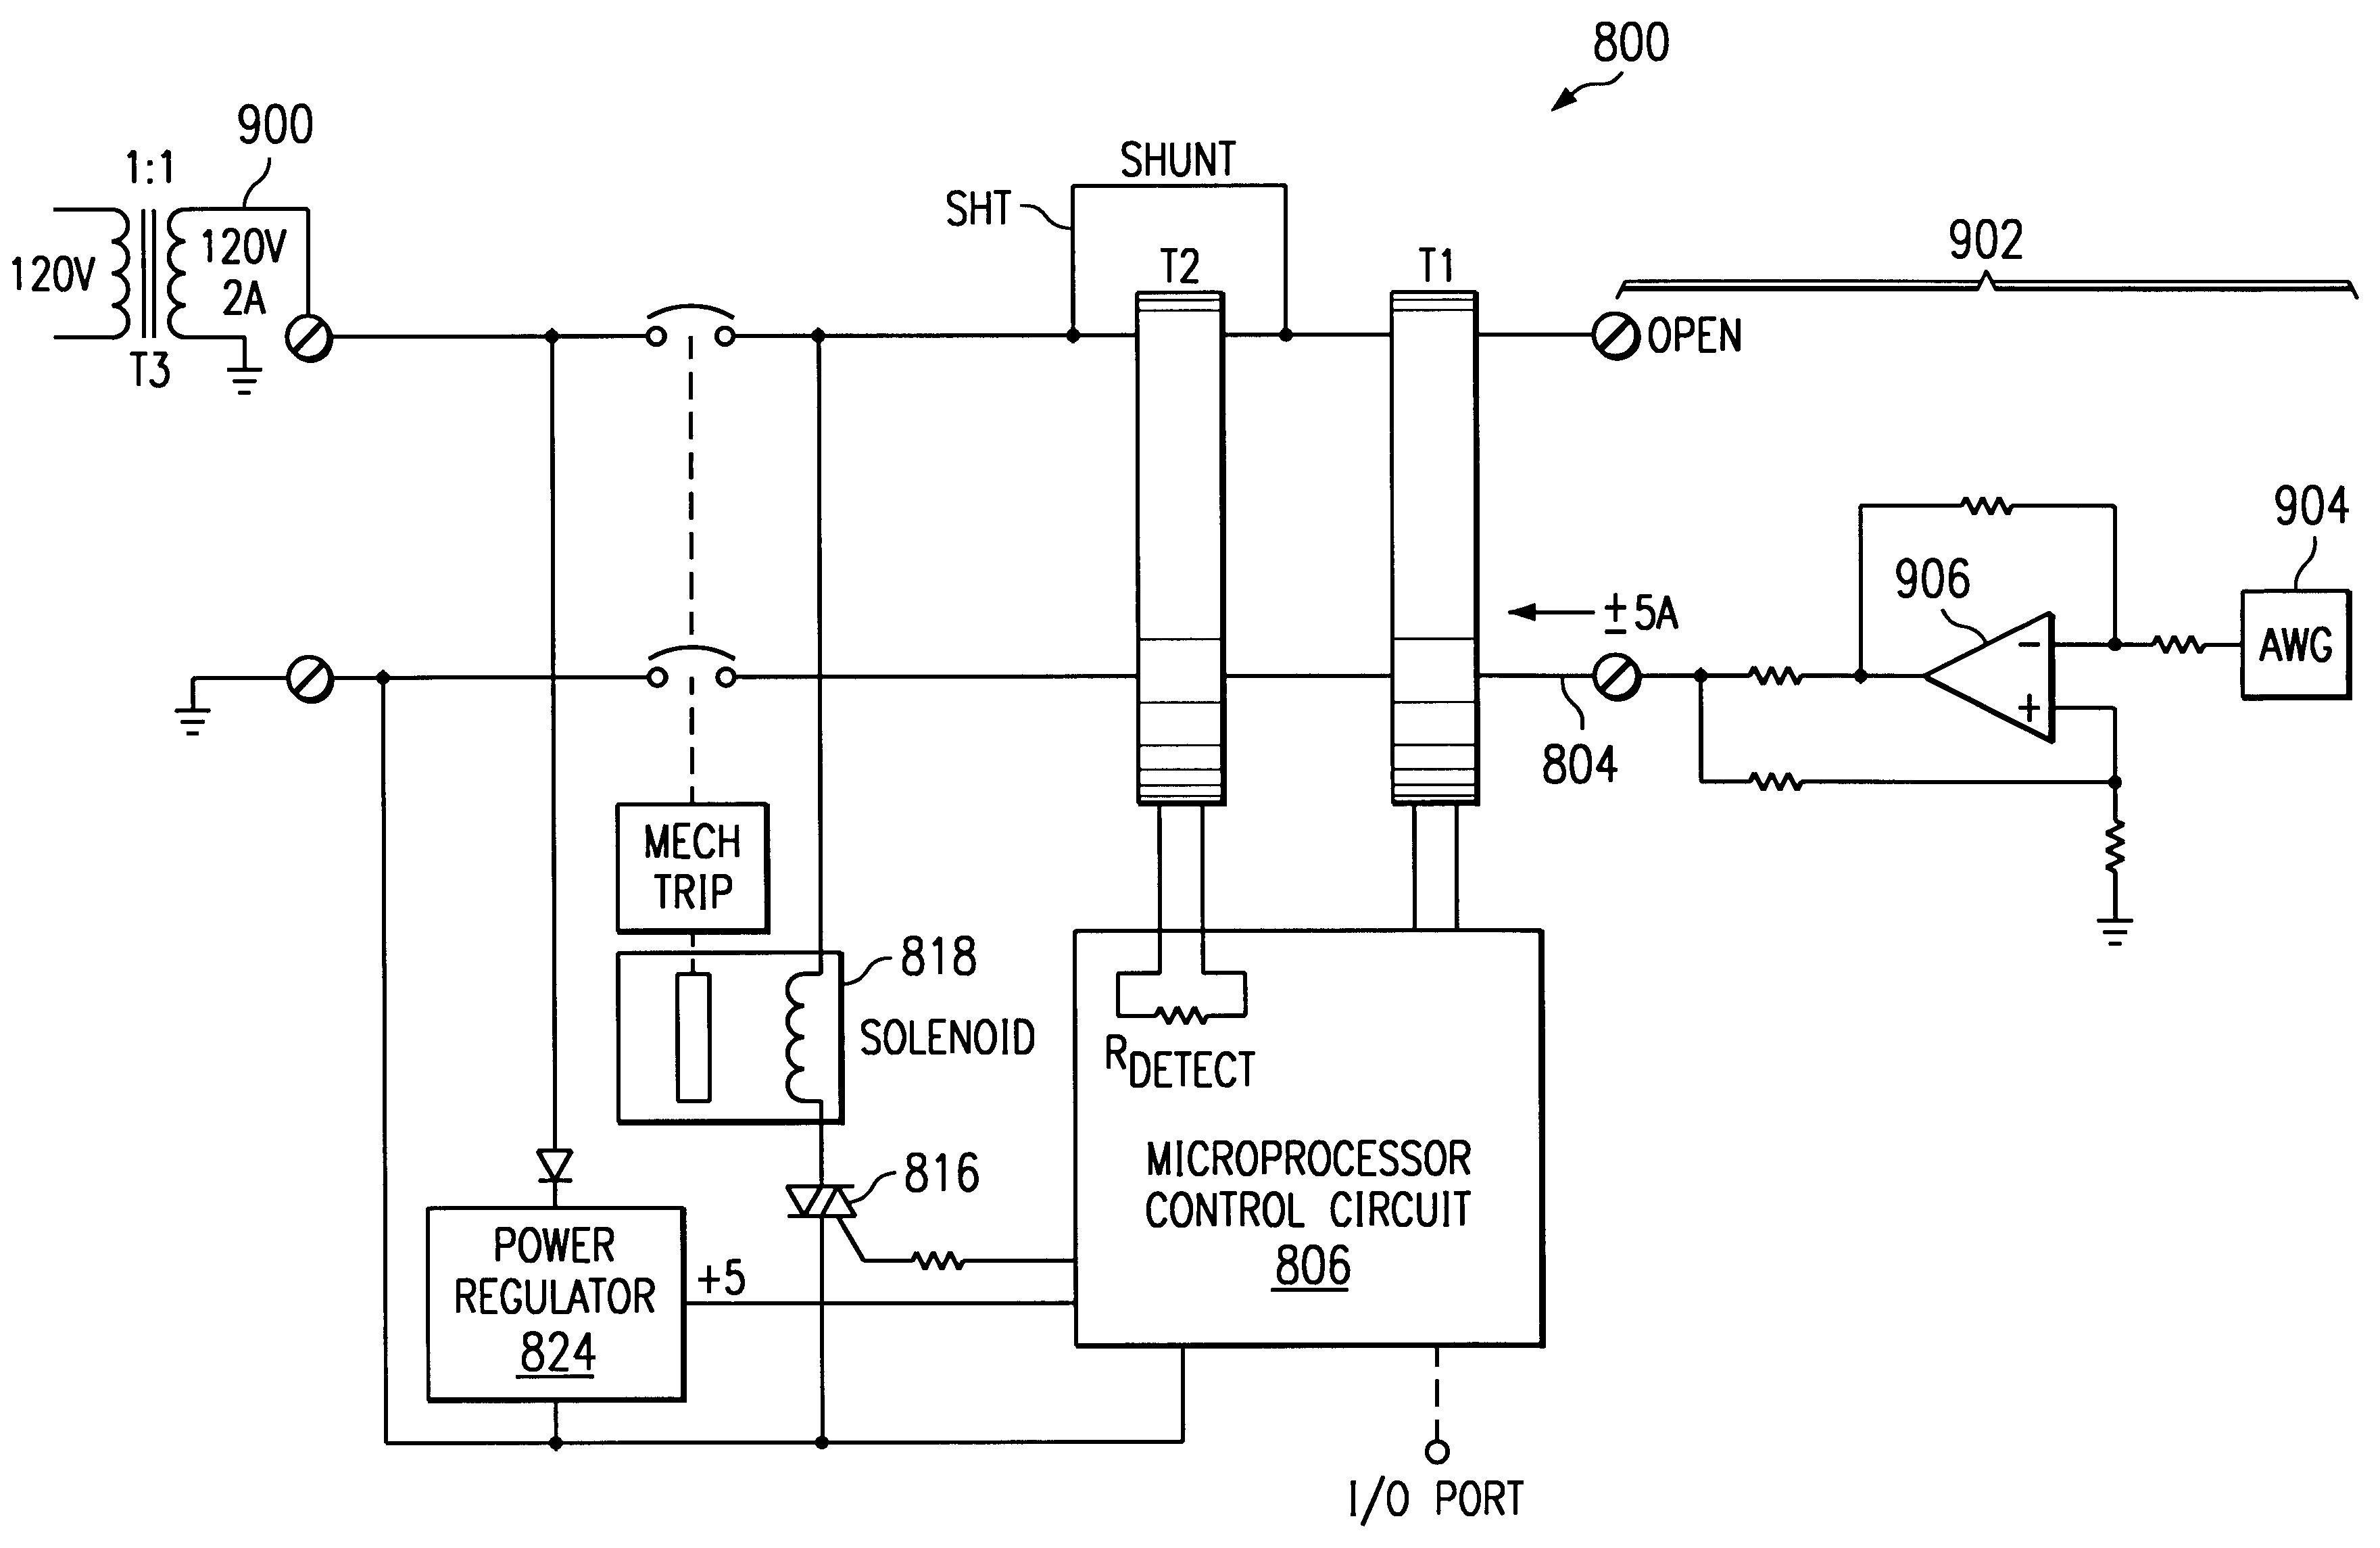 3 Pole Circuit Breaker Wiring Diagram Sample - 2 Pole Circuit Breaker Wiring Diagram